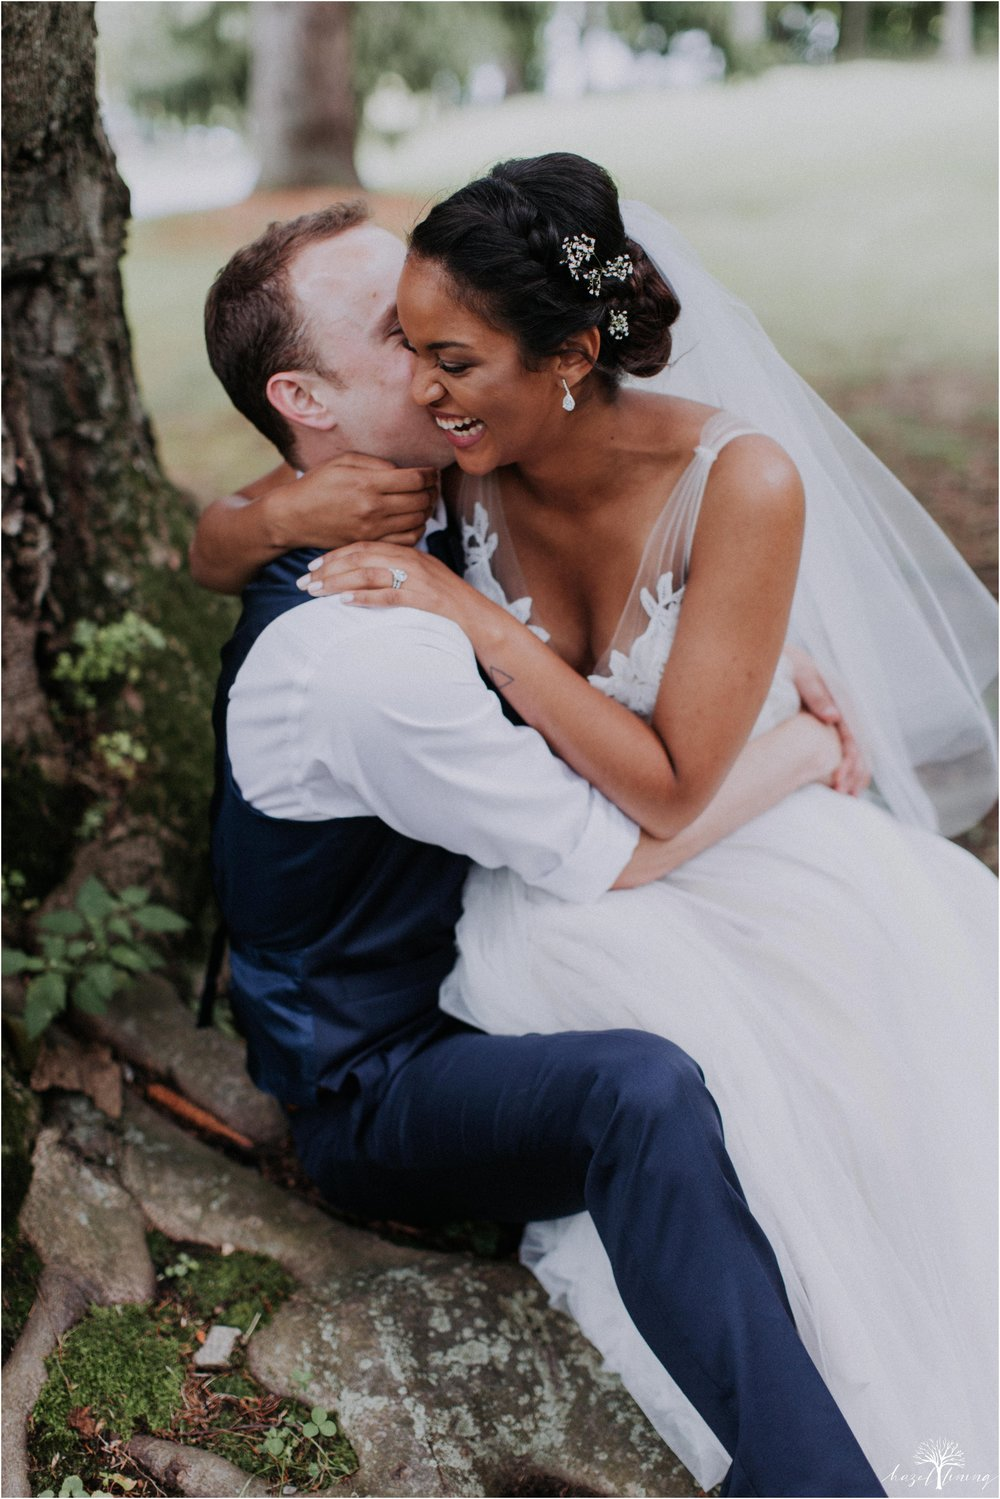 mariah-kreyling-samuel-sherratt-sherrattwiththeworld-peirce-farm-at-witch-hill-boston-massachusetts-wedding-photography-hazel-lining-travel-wedding-elopement-photography_0130.jpg